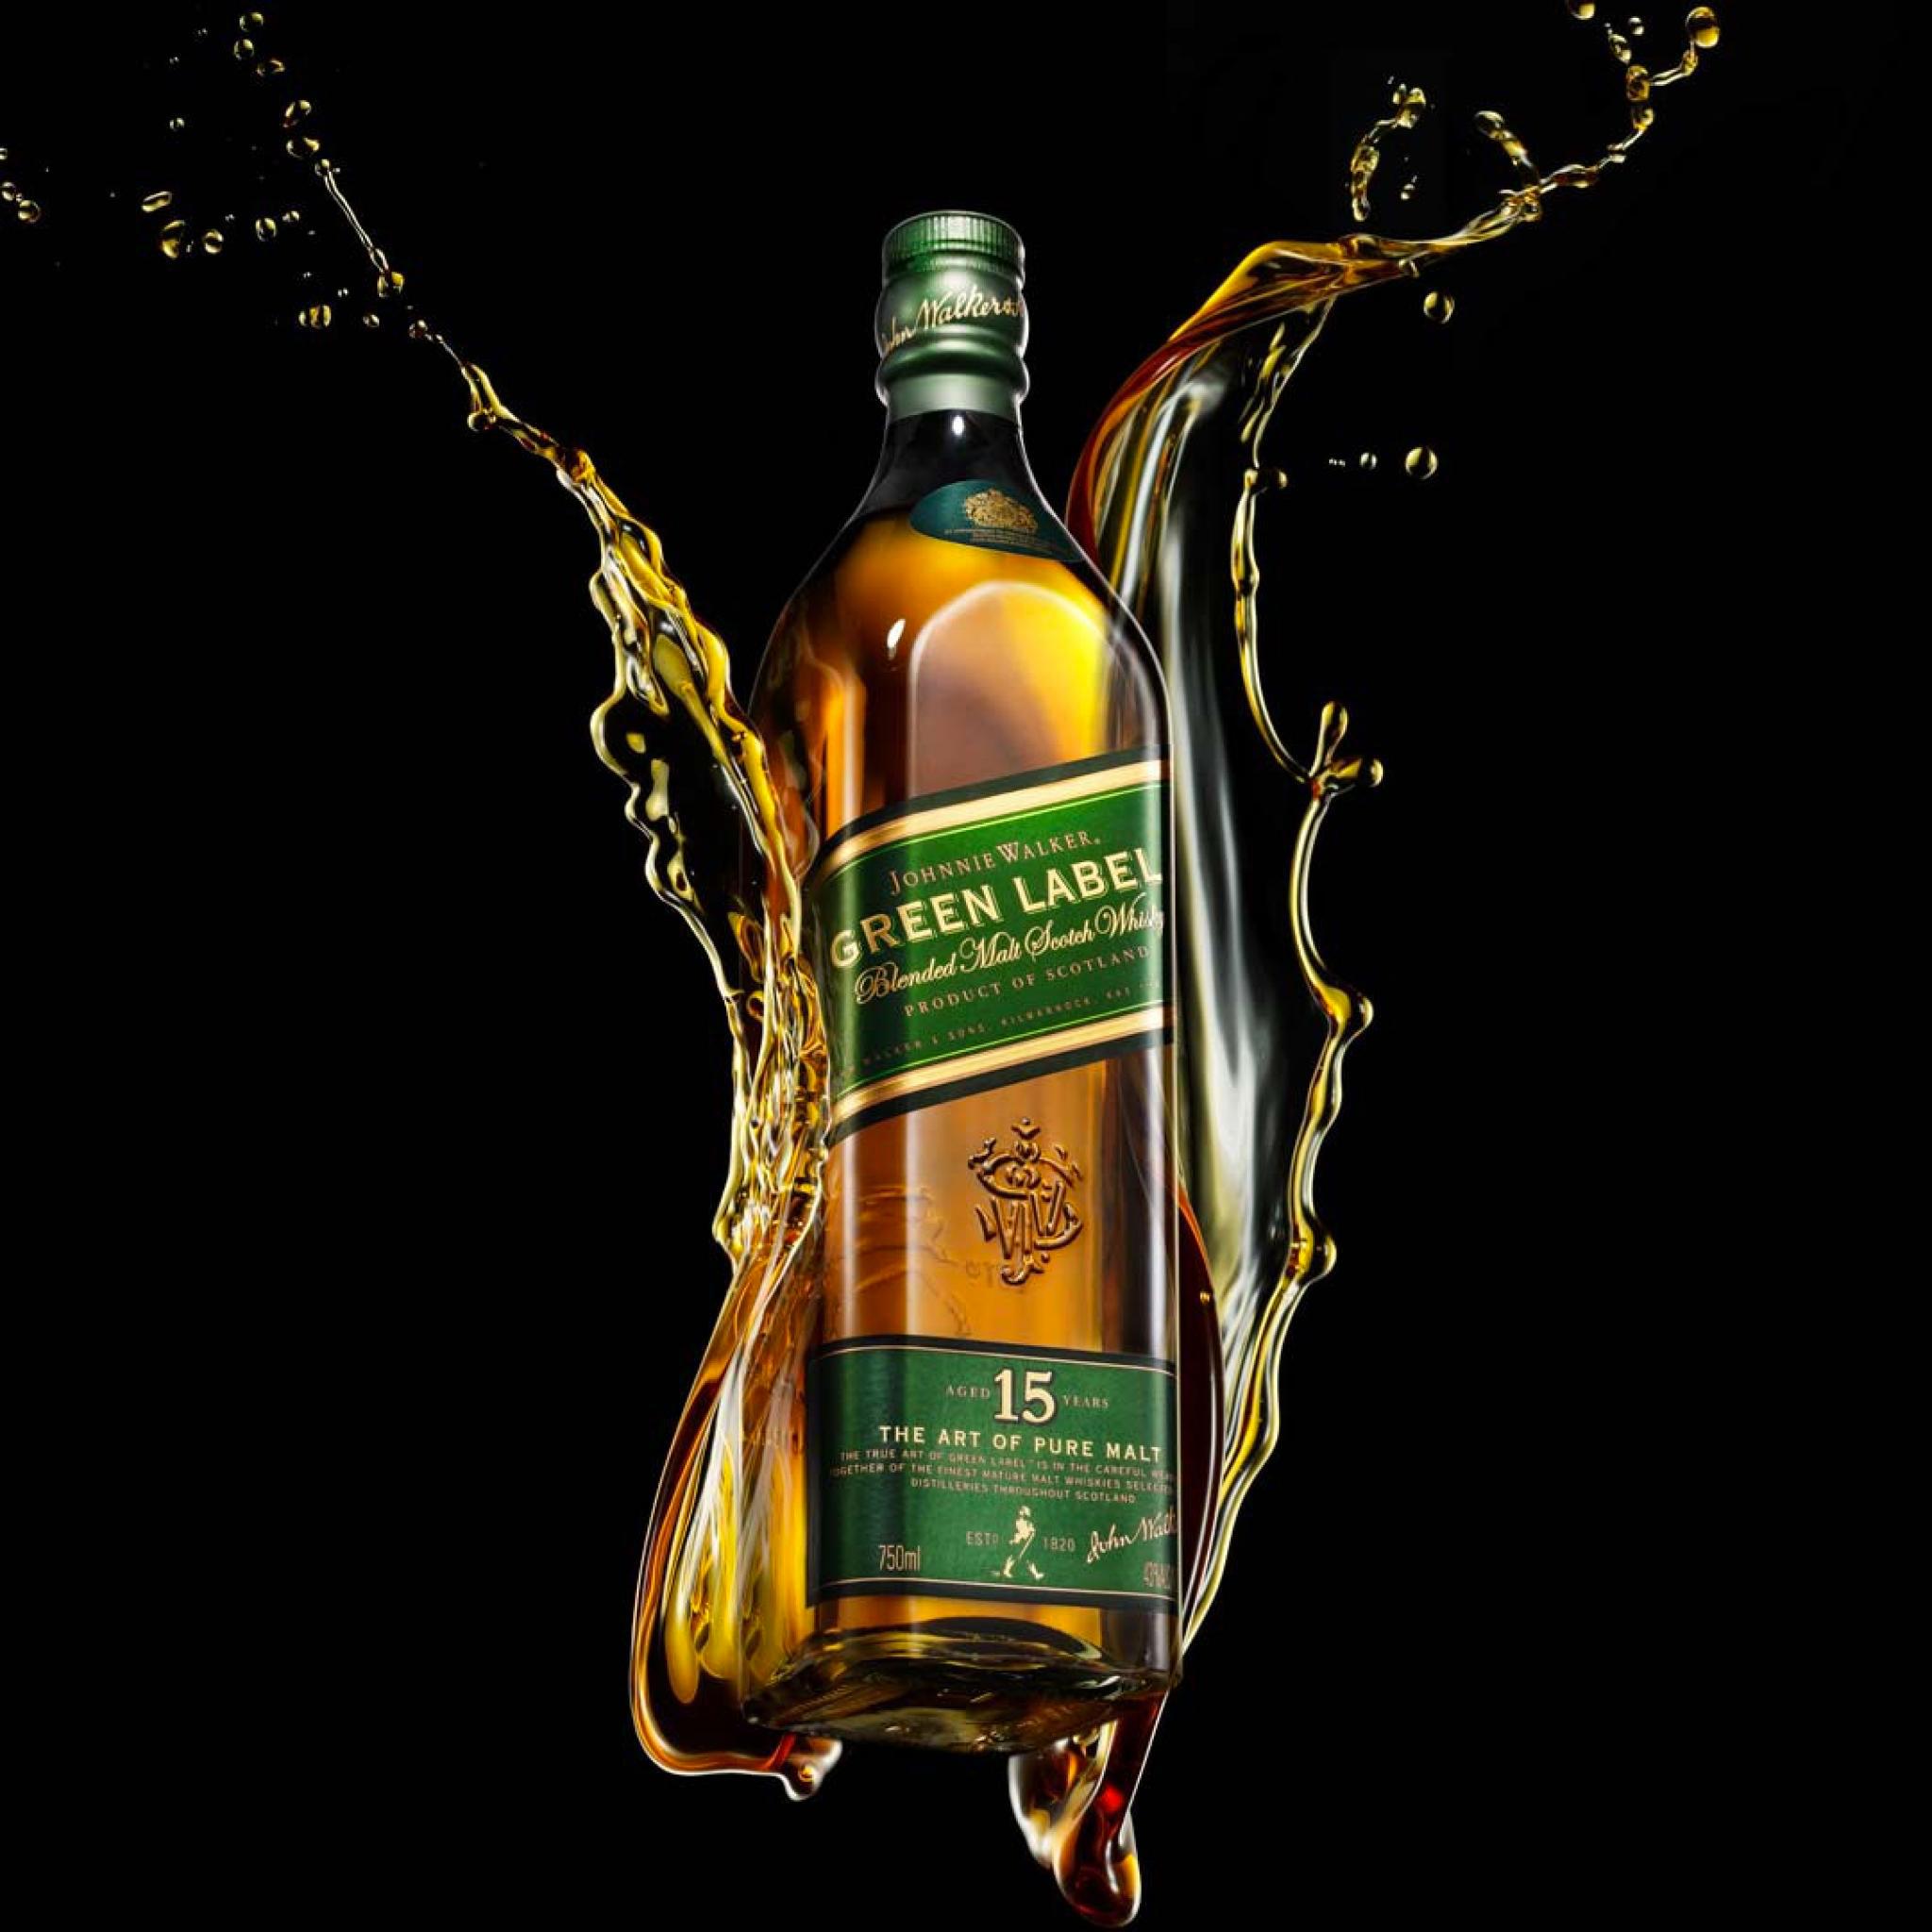 Green-Alcohol-Drink-Johnnie-Walker-3Wallpapers-iPad-Retina